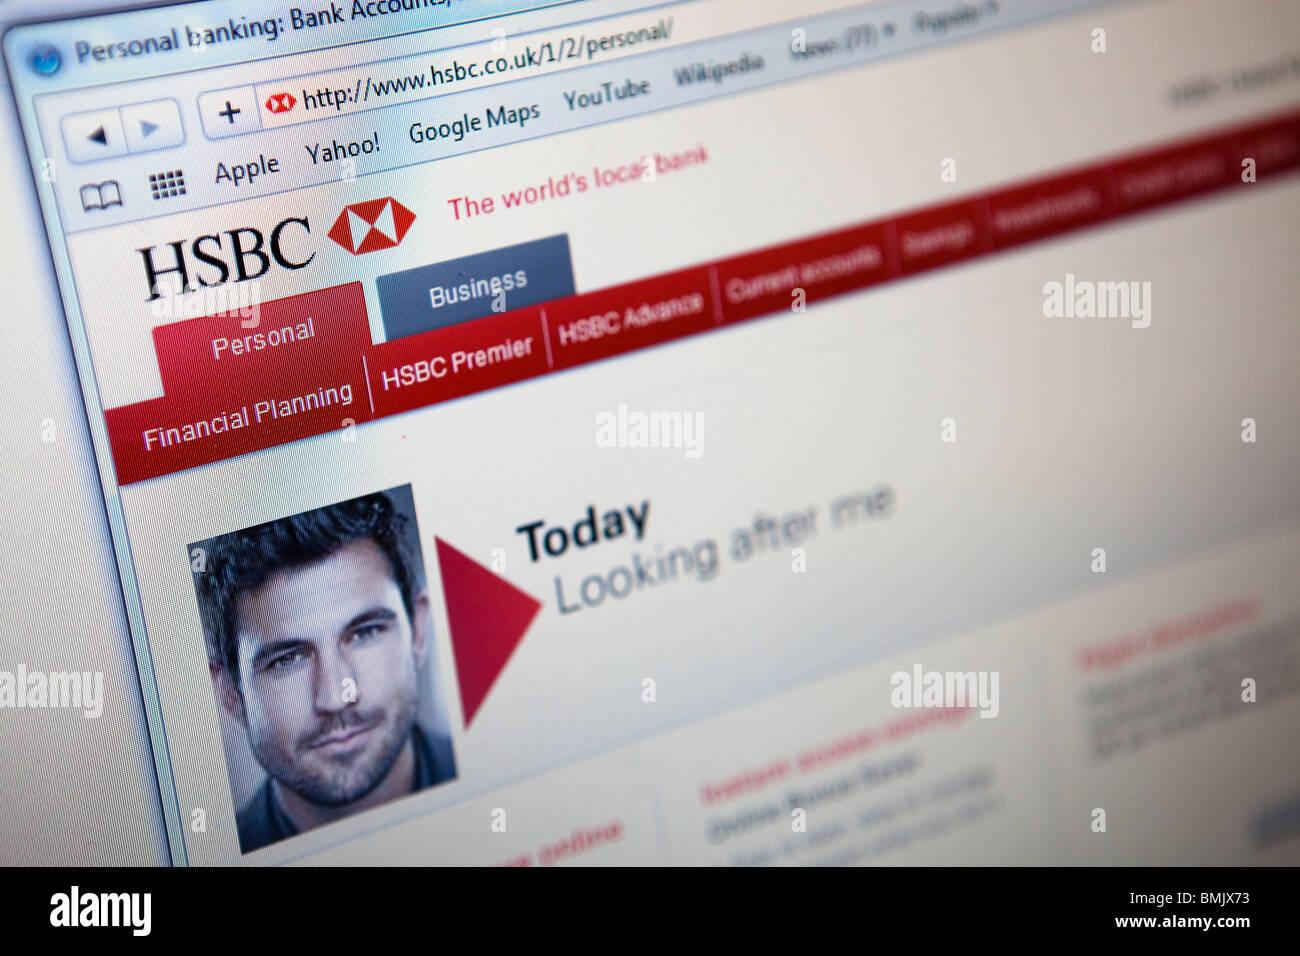 Hsbc Online Banking Website Stock Photos & Hsbc Online Banking